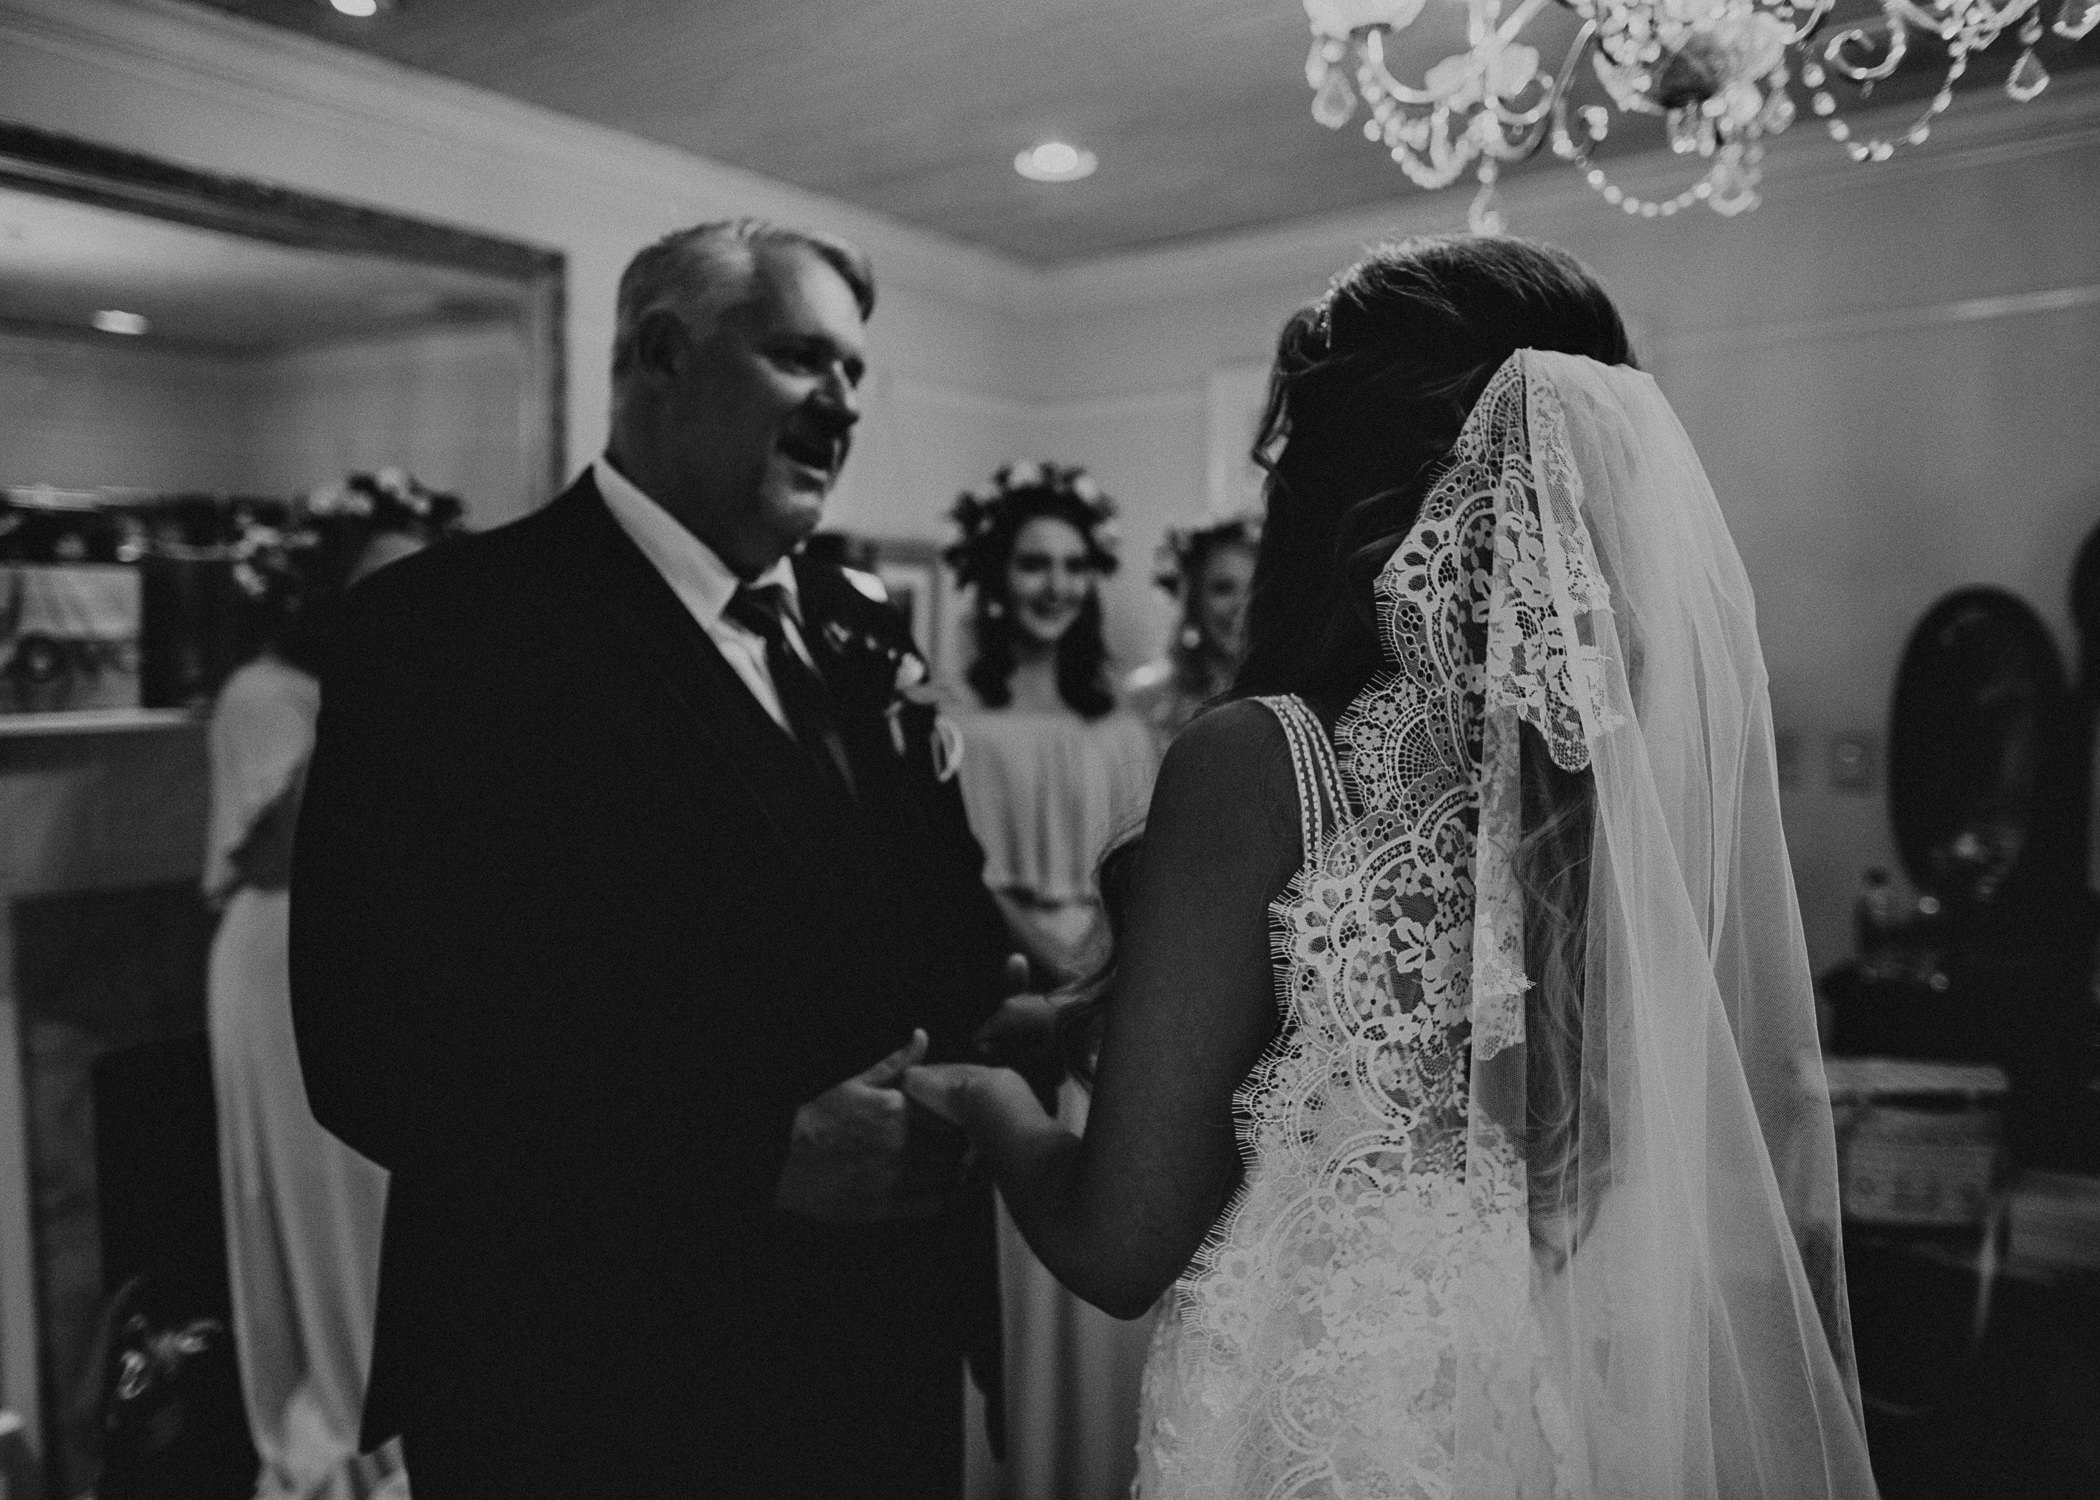 22Carl House Wedding Venue Ga, Atlanta Wedding Photographer - Boho, Bohemian, Junebug Weddings, Vintage, Retro, Trendy. Aline Marin Photography. .jpg